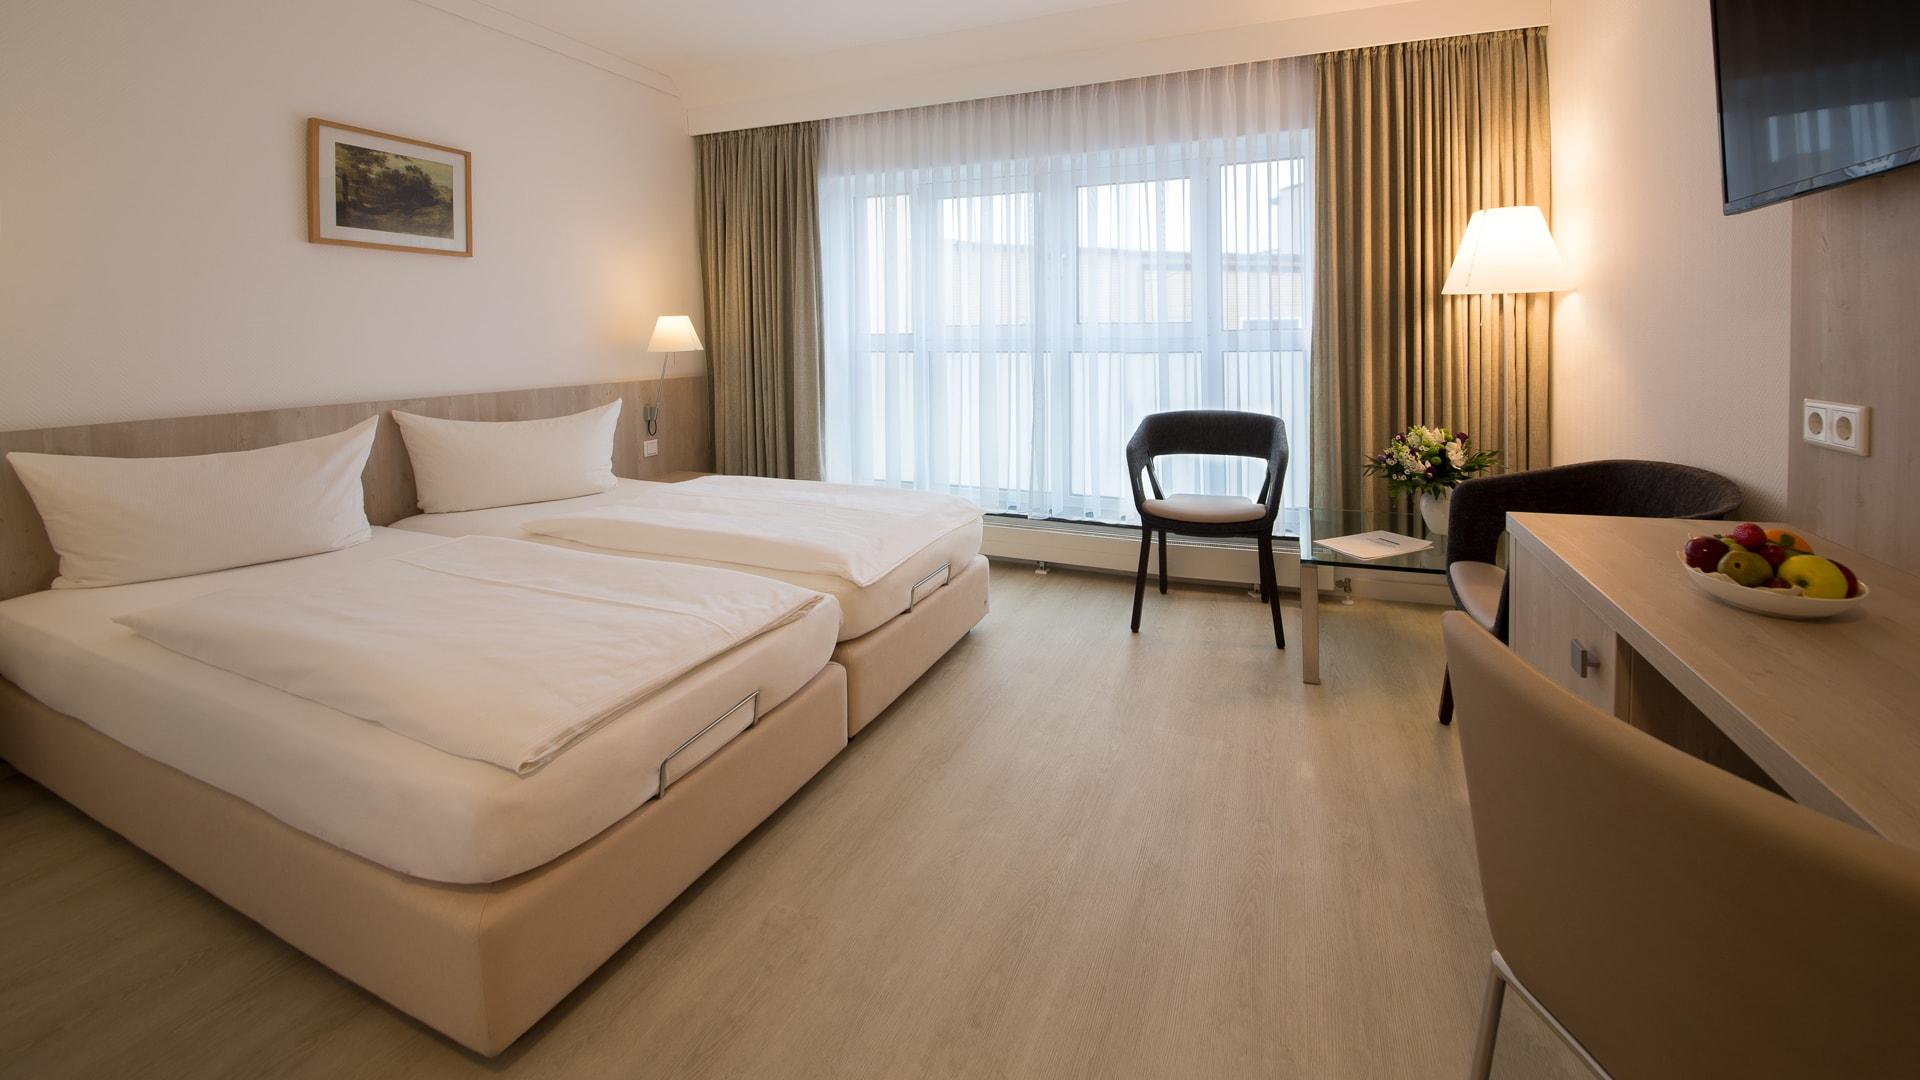 2 Michels_Hotels_Strandhotel_Germania_Doppelzimmer_Standard